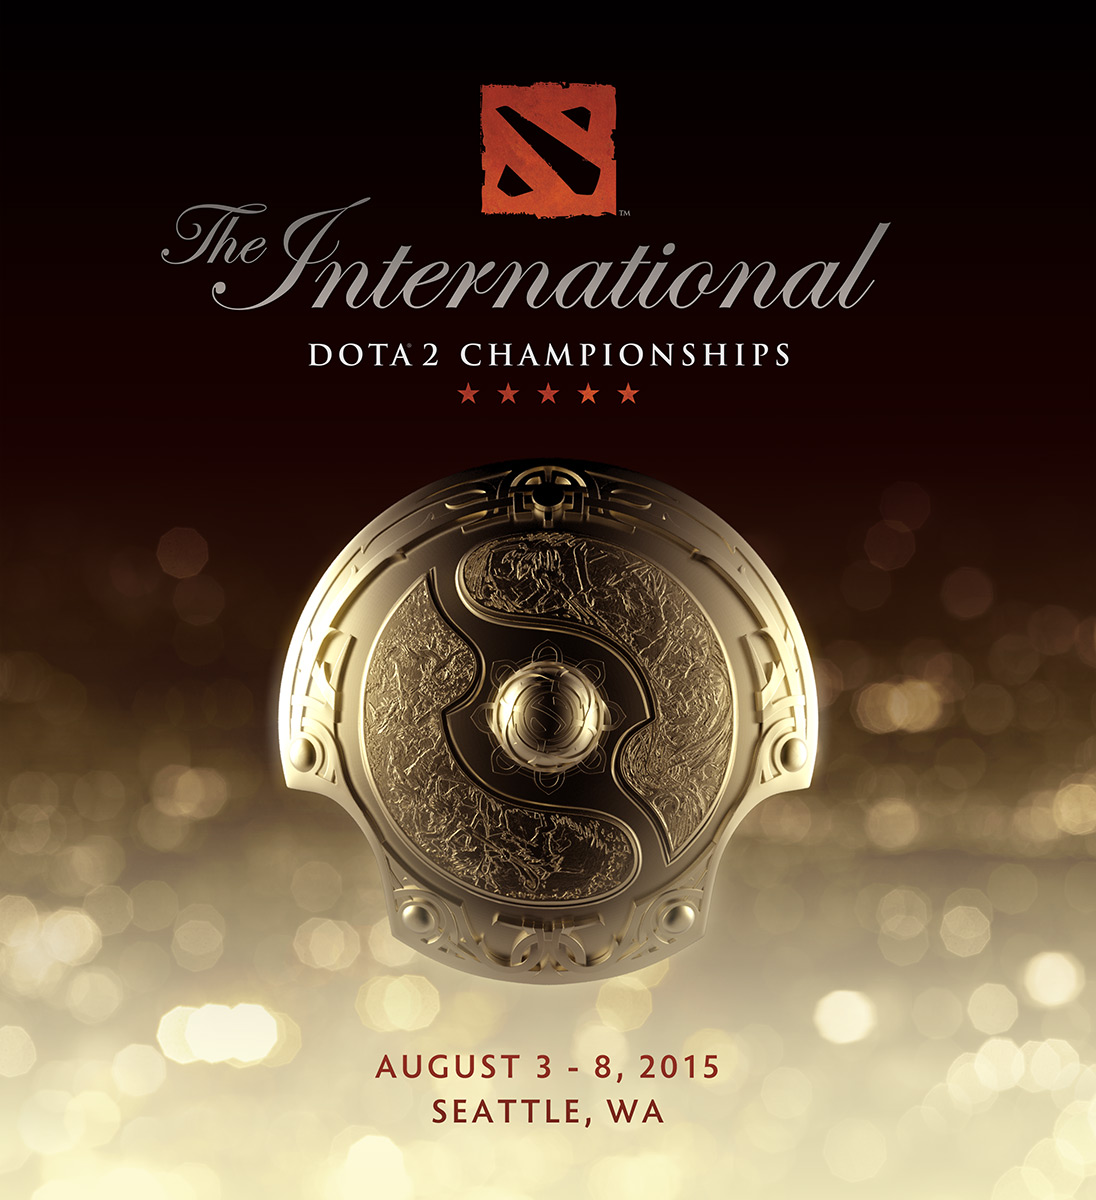 Dota 2 The International 2015 Seattle Dates